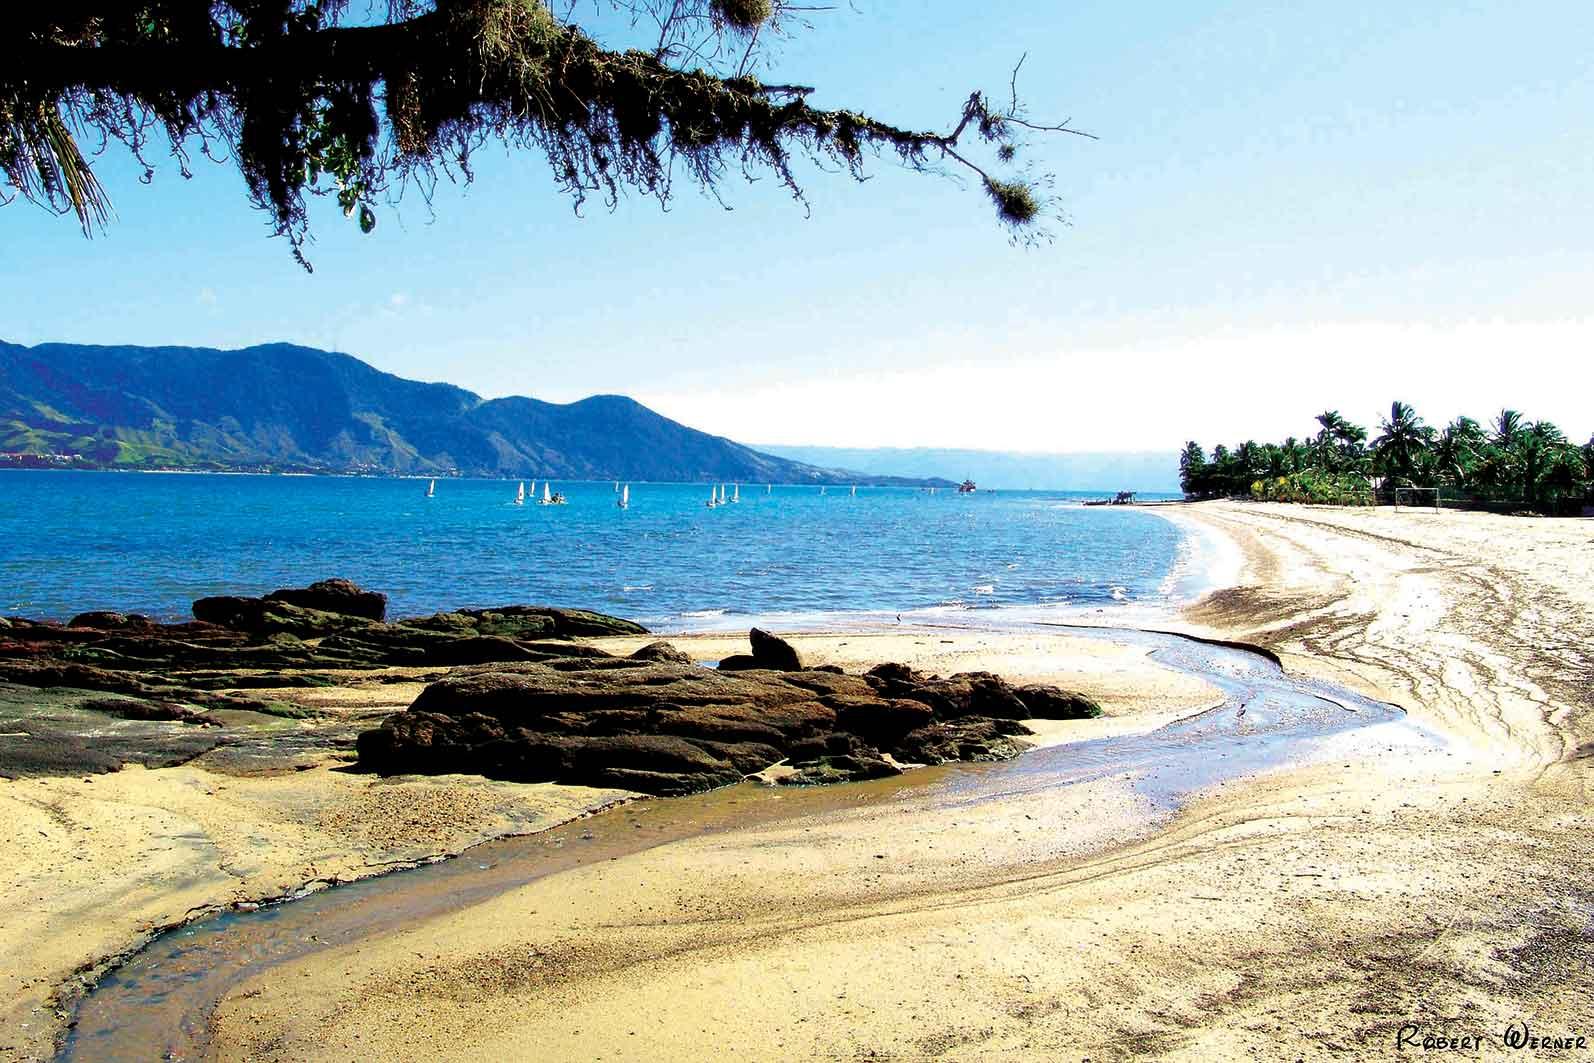 Praias do Centro - Ilhabela-meio-ambiente-praia-de-Itaquanduba-centro-robert-werner-bx